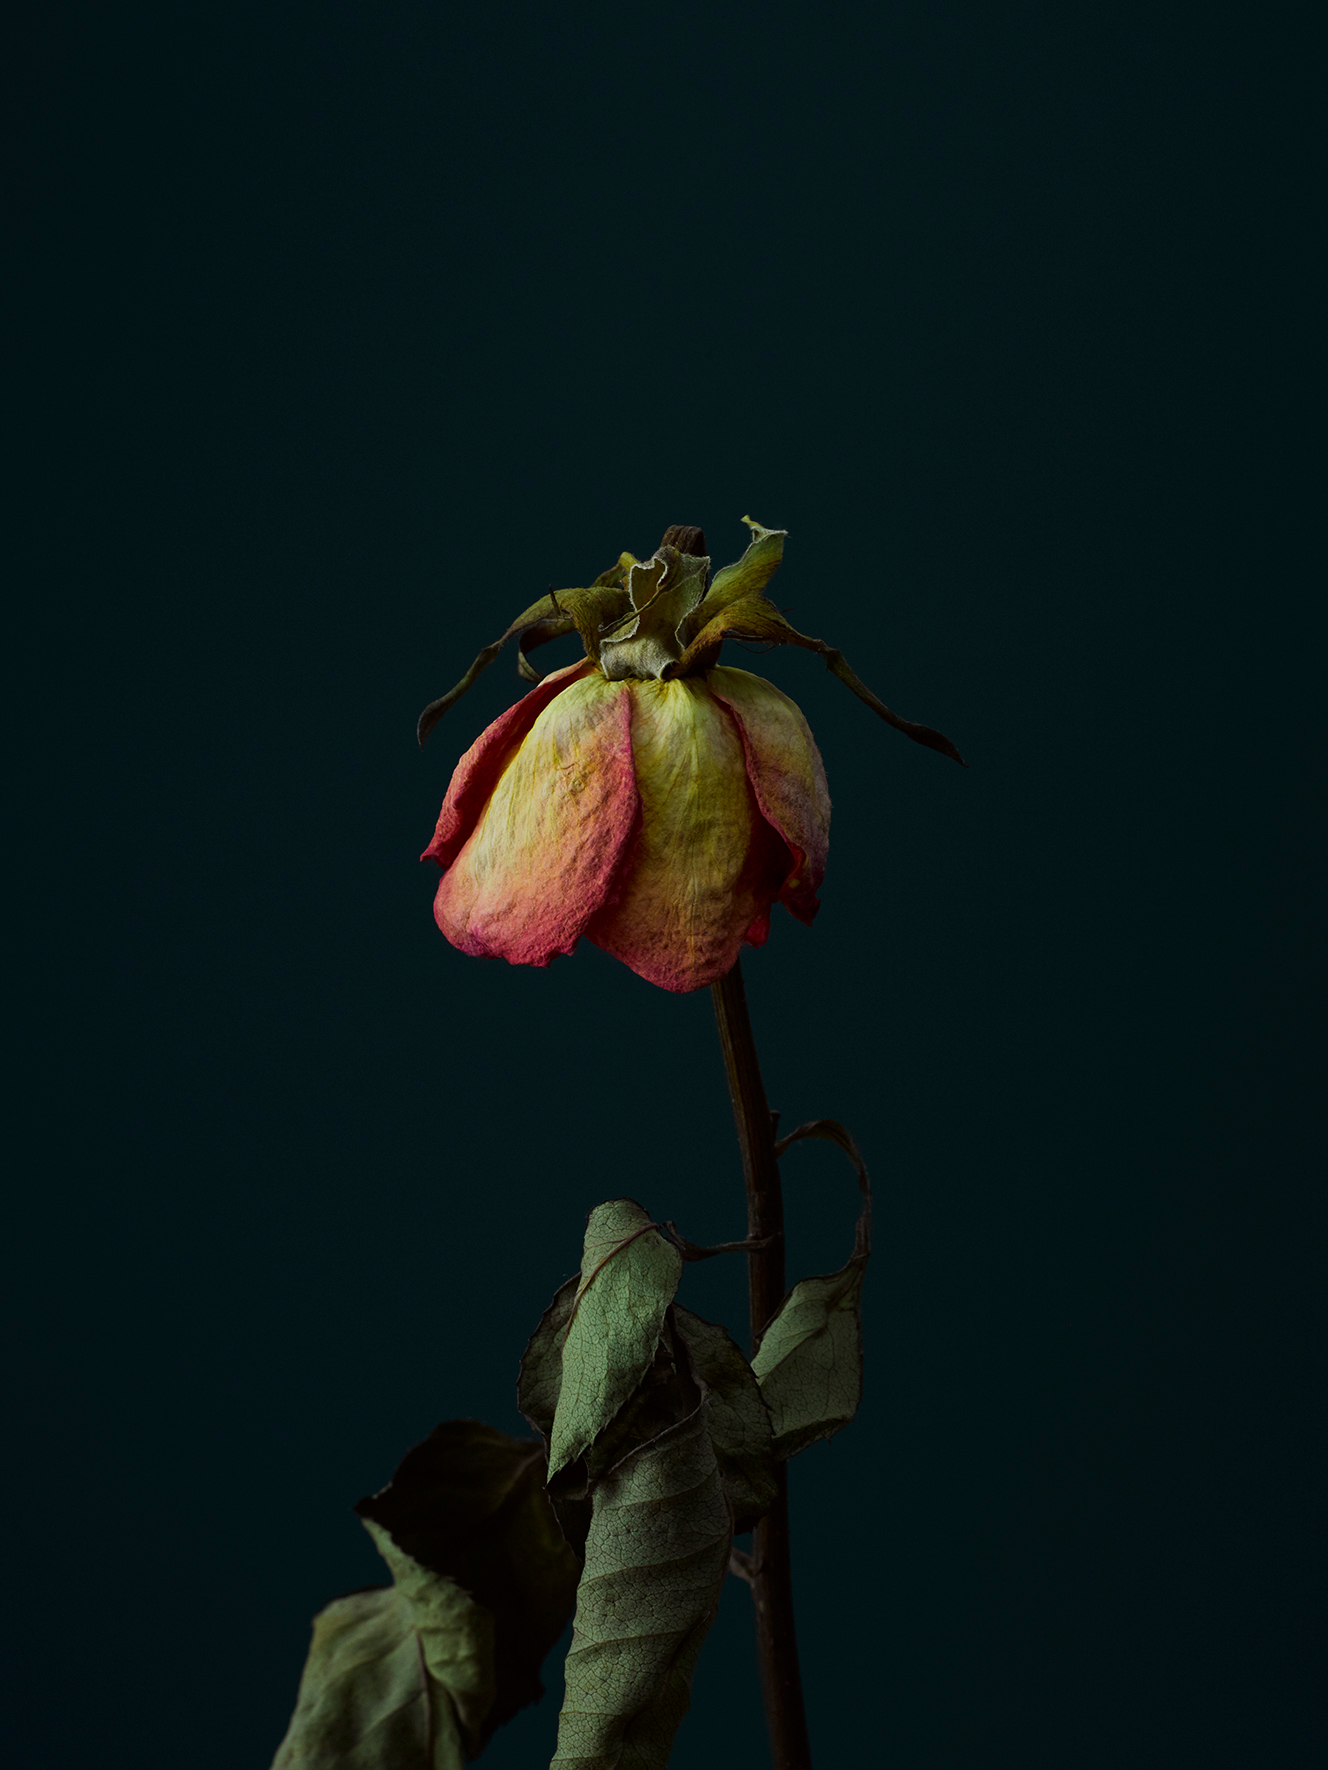 rose-7-copy.jpg